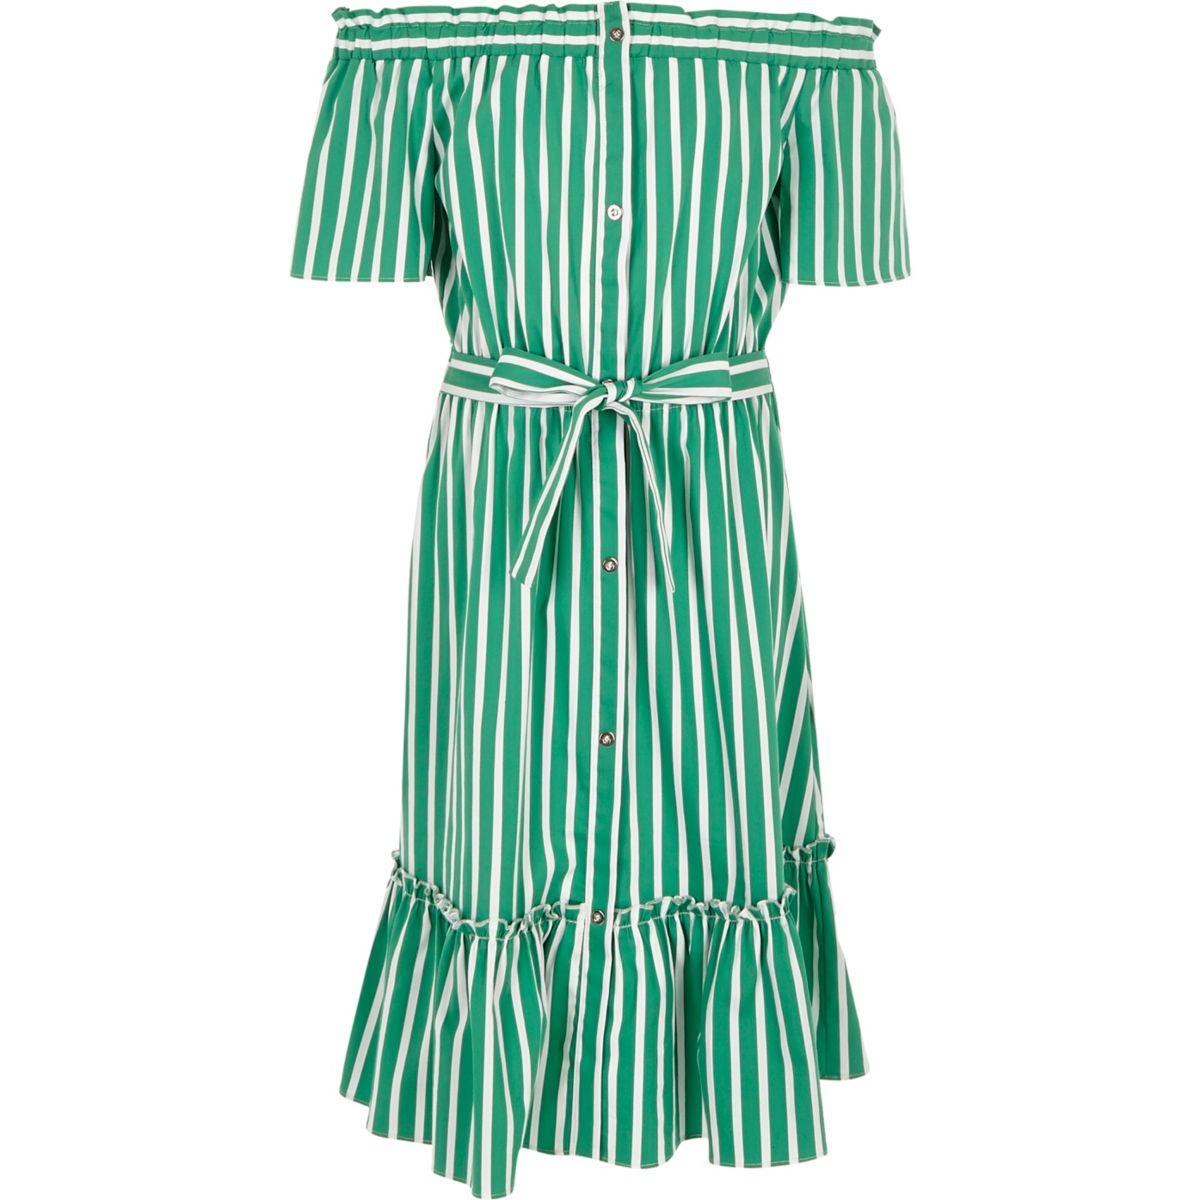 Grün gestreiftes Bardot-Kleid mit Gürtel